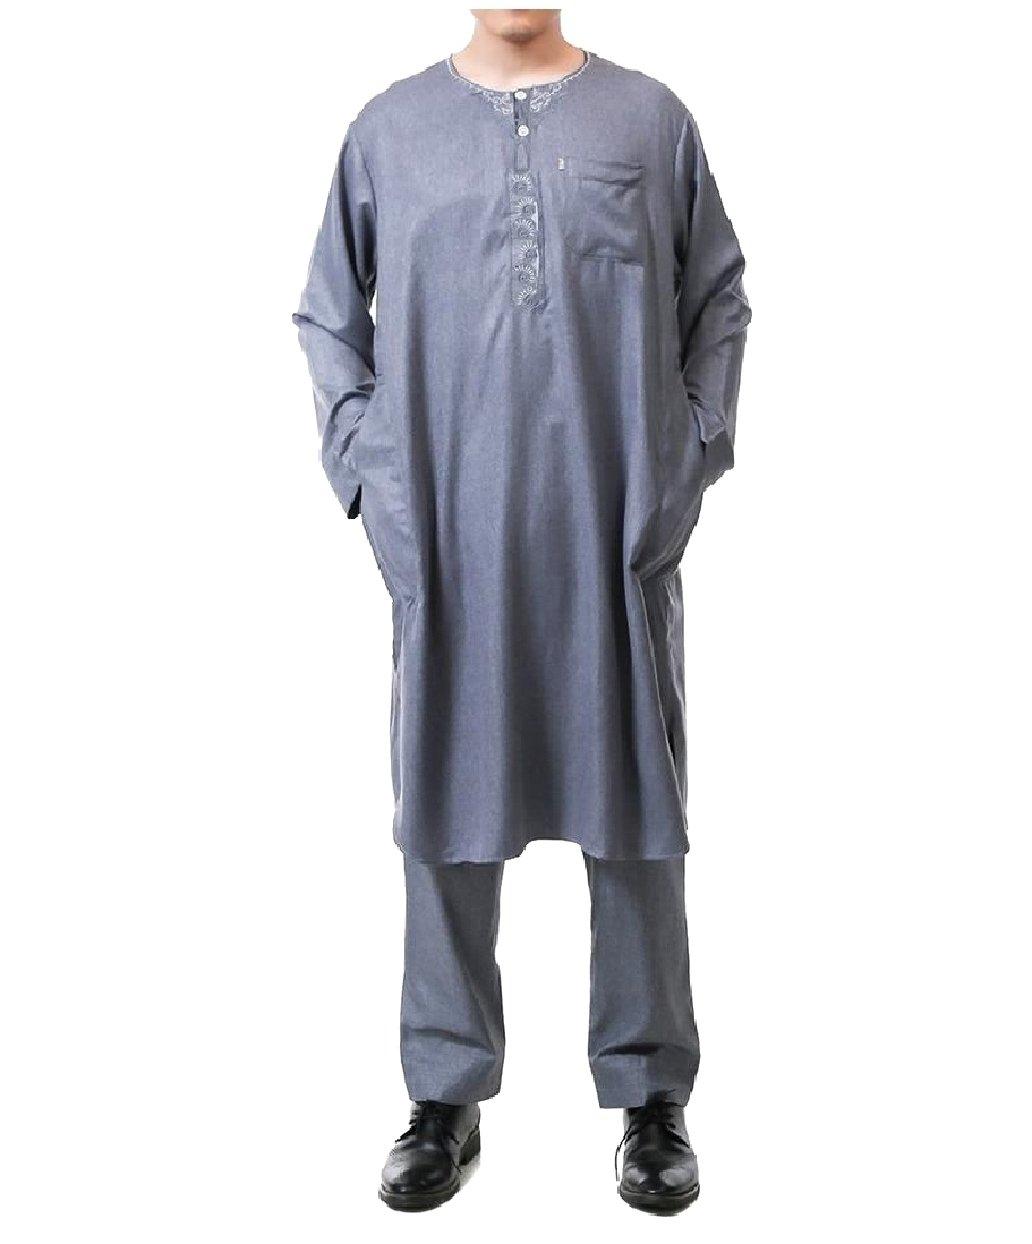 Abetteric Mens 2-Piece Cotton Linen Blend Islamic Muslim Salwar Suit Sets Dark Grey 60